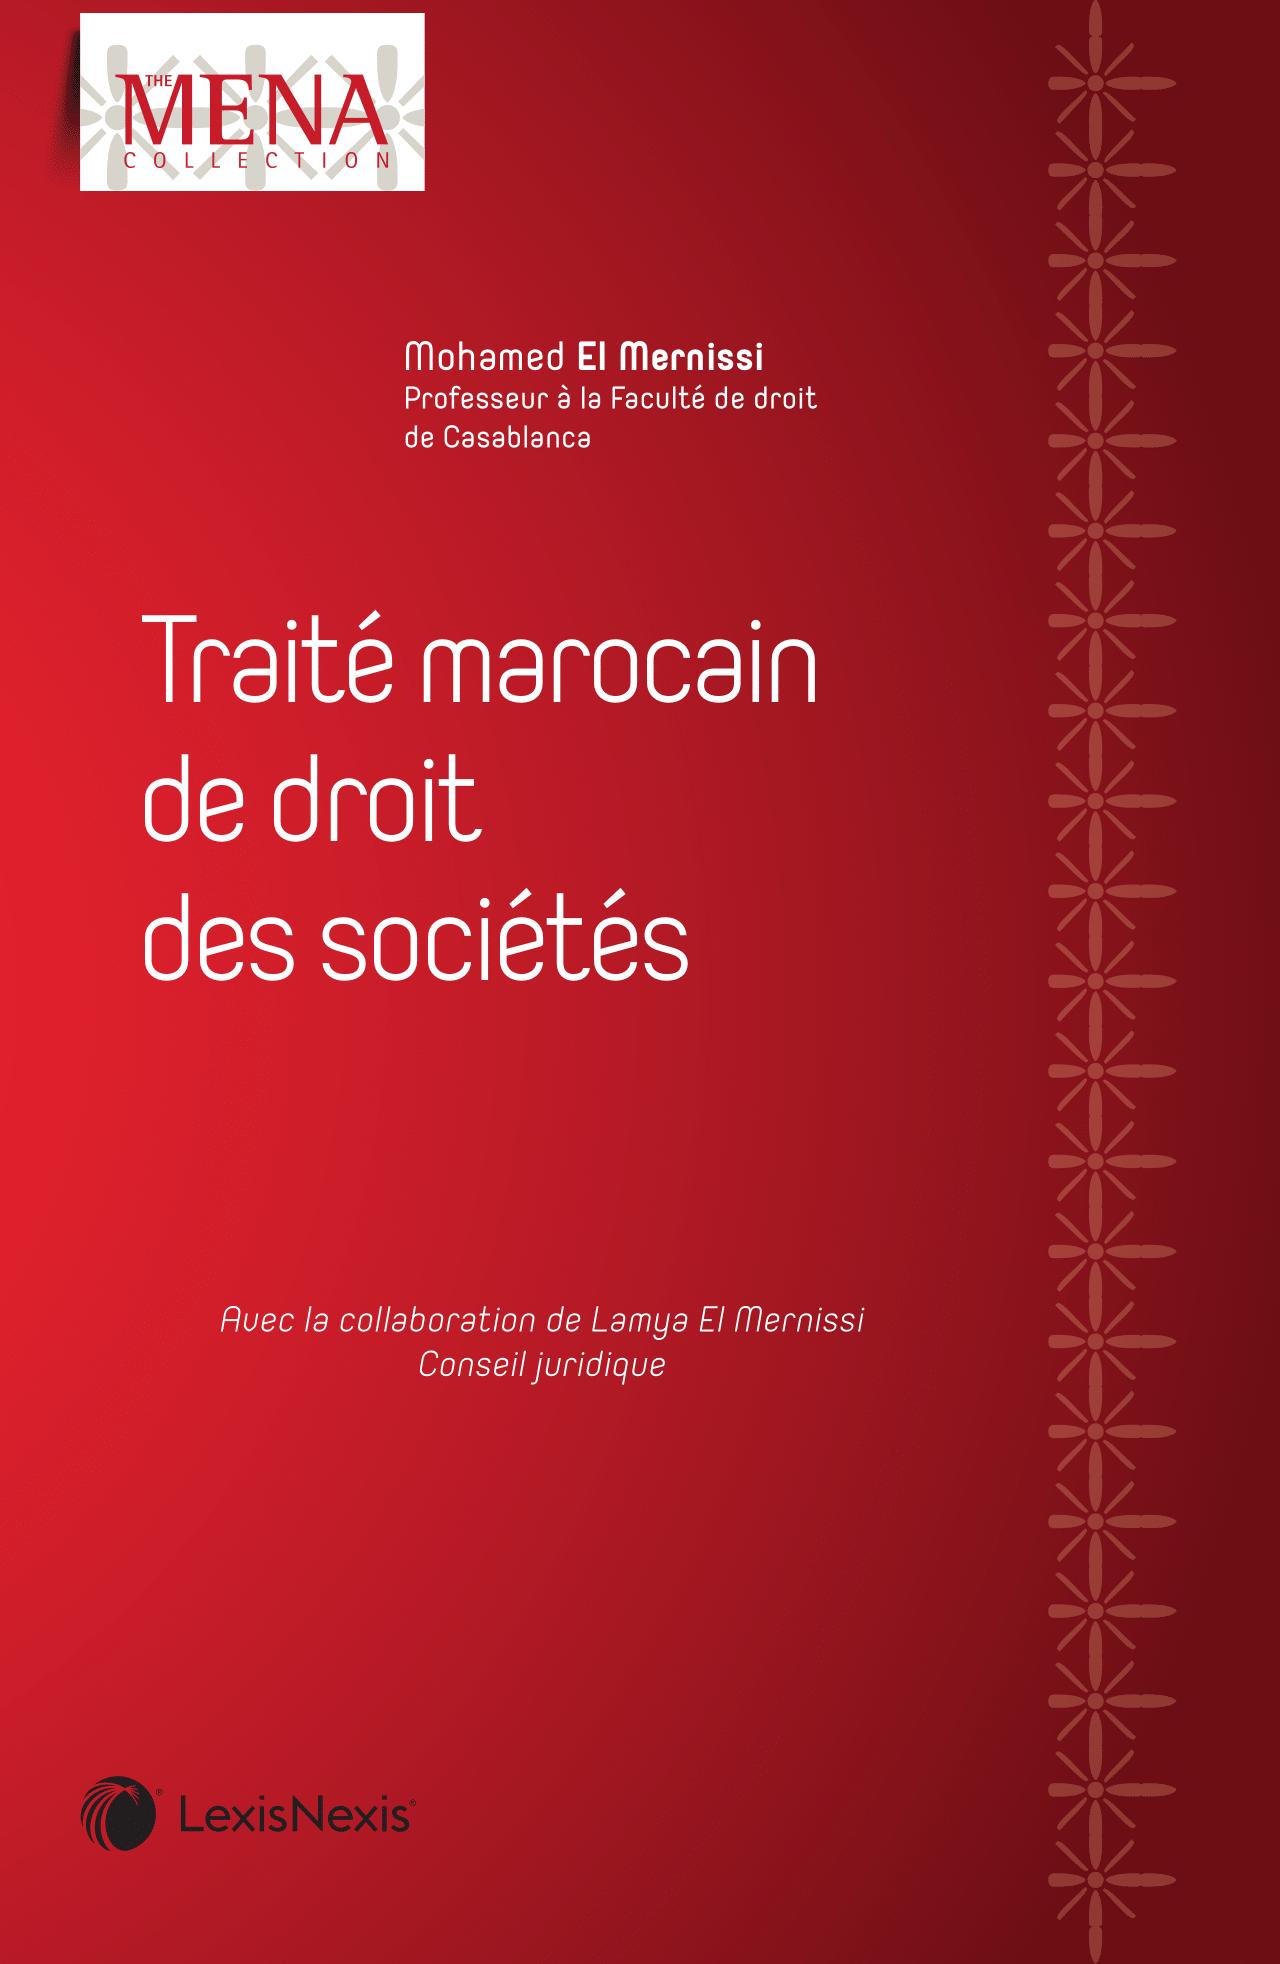 Boutique Lexisnexis Traite Marocain De Droit Des Societes Lexisnexis Hors Collections